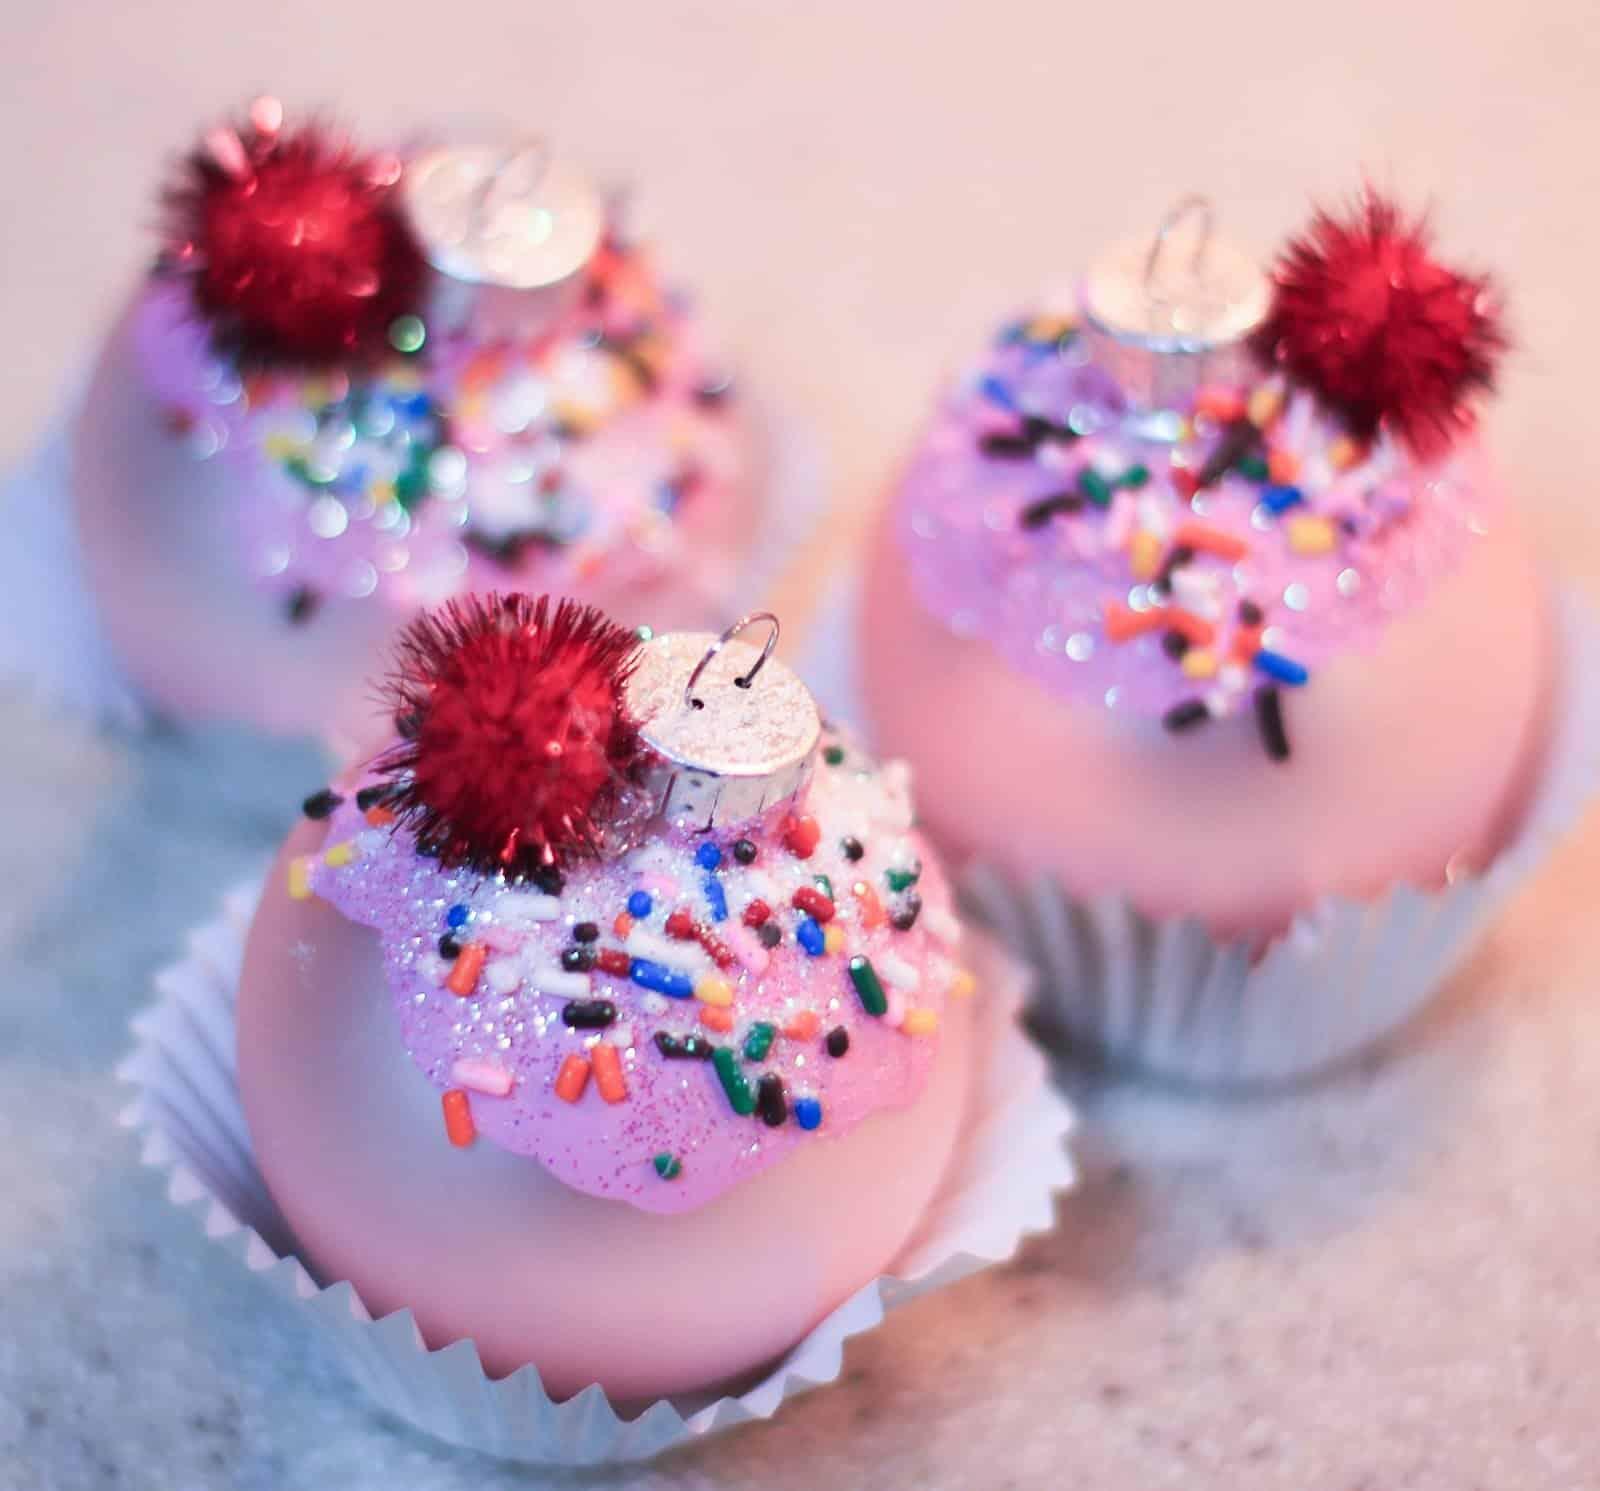 Pom pom and sprinkle Christmas ornament cupcakes 15 Delicious Christmas Cupcake Ideas and Recipes